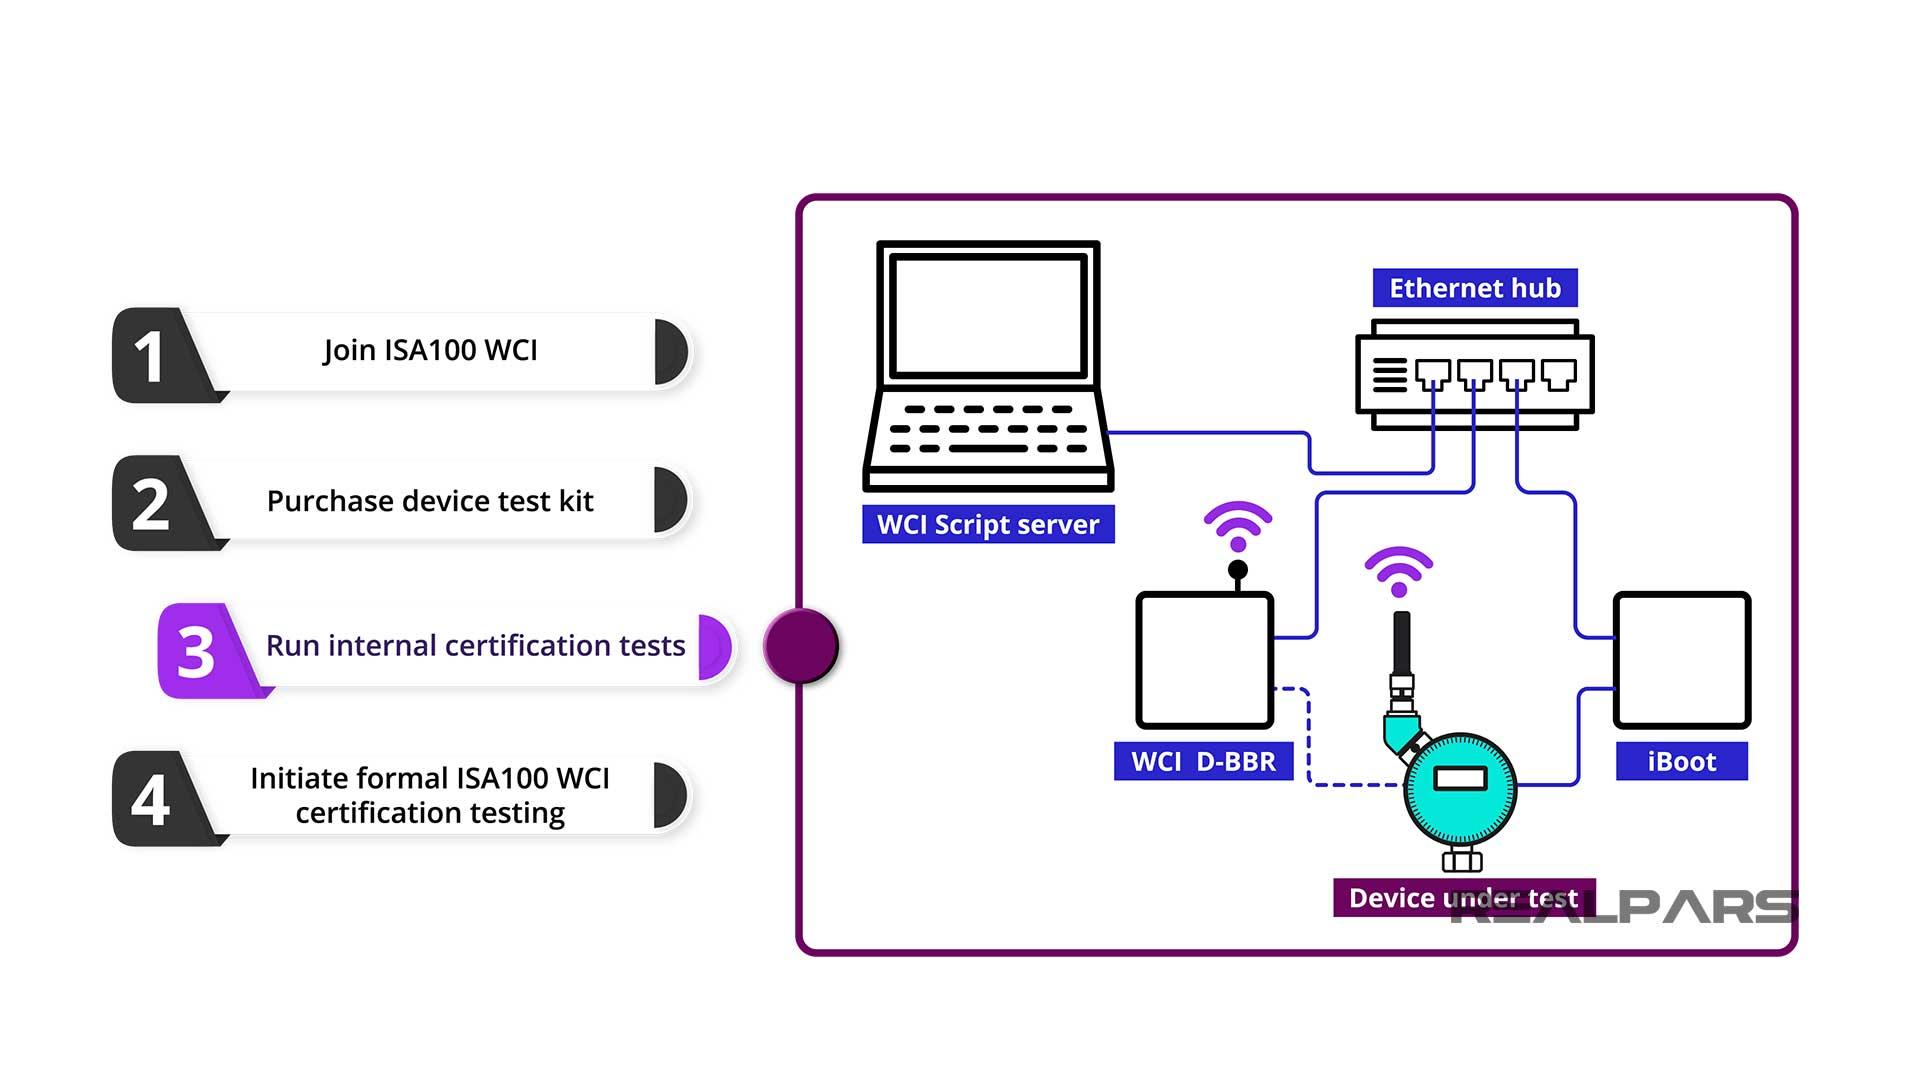 Internal certification tests